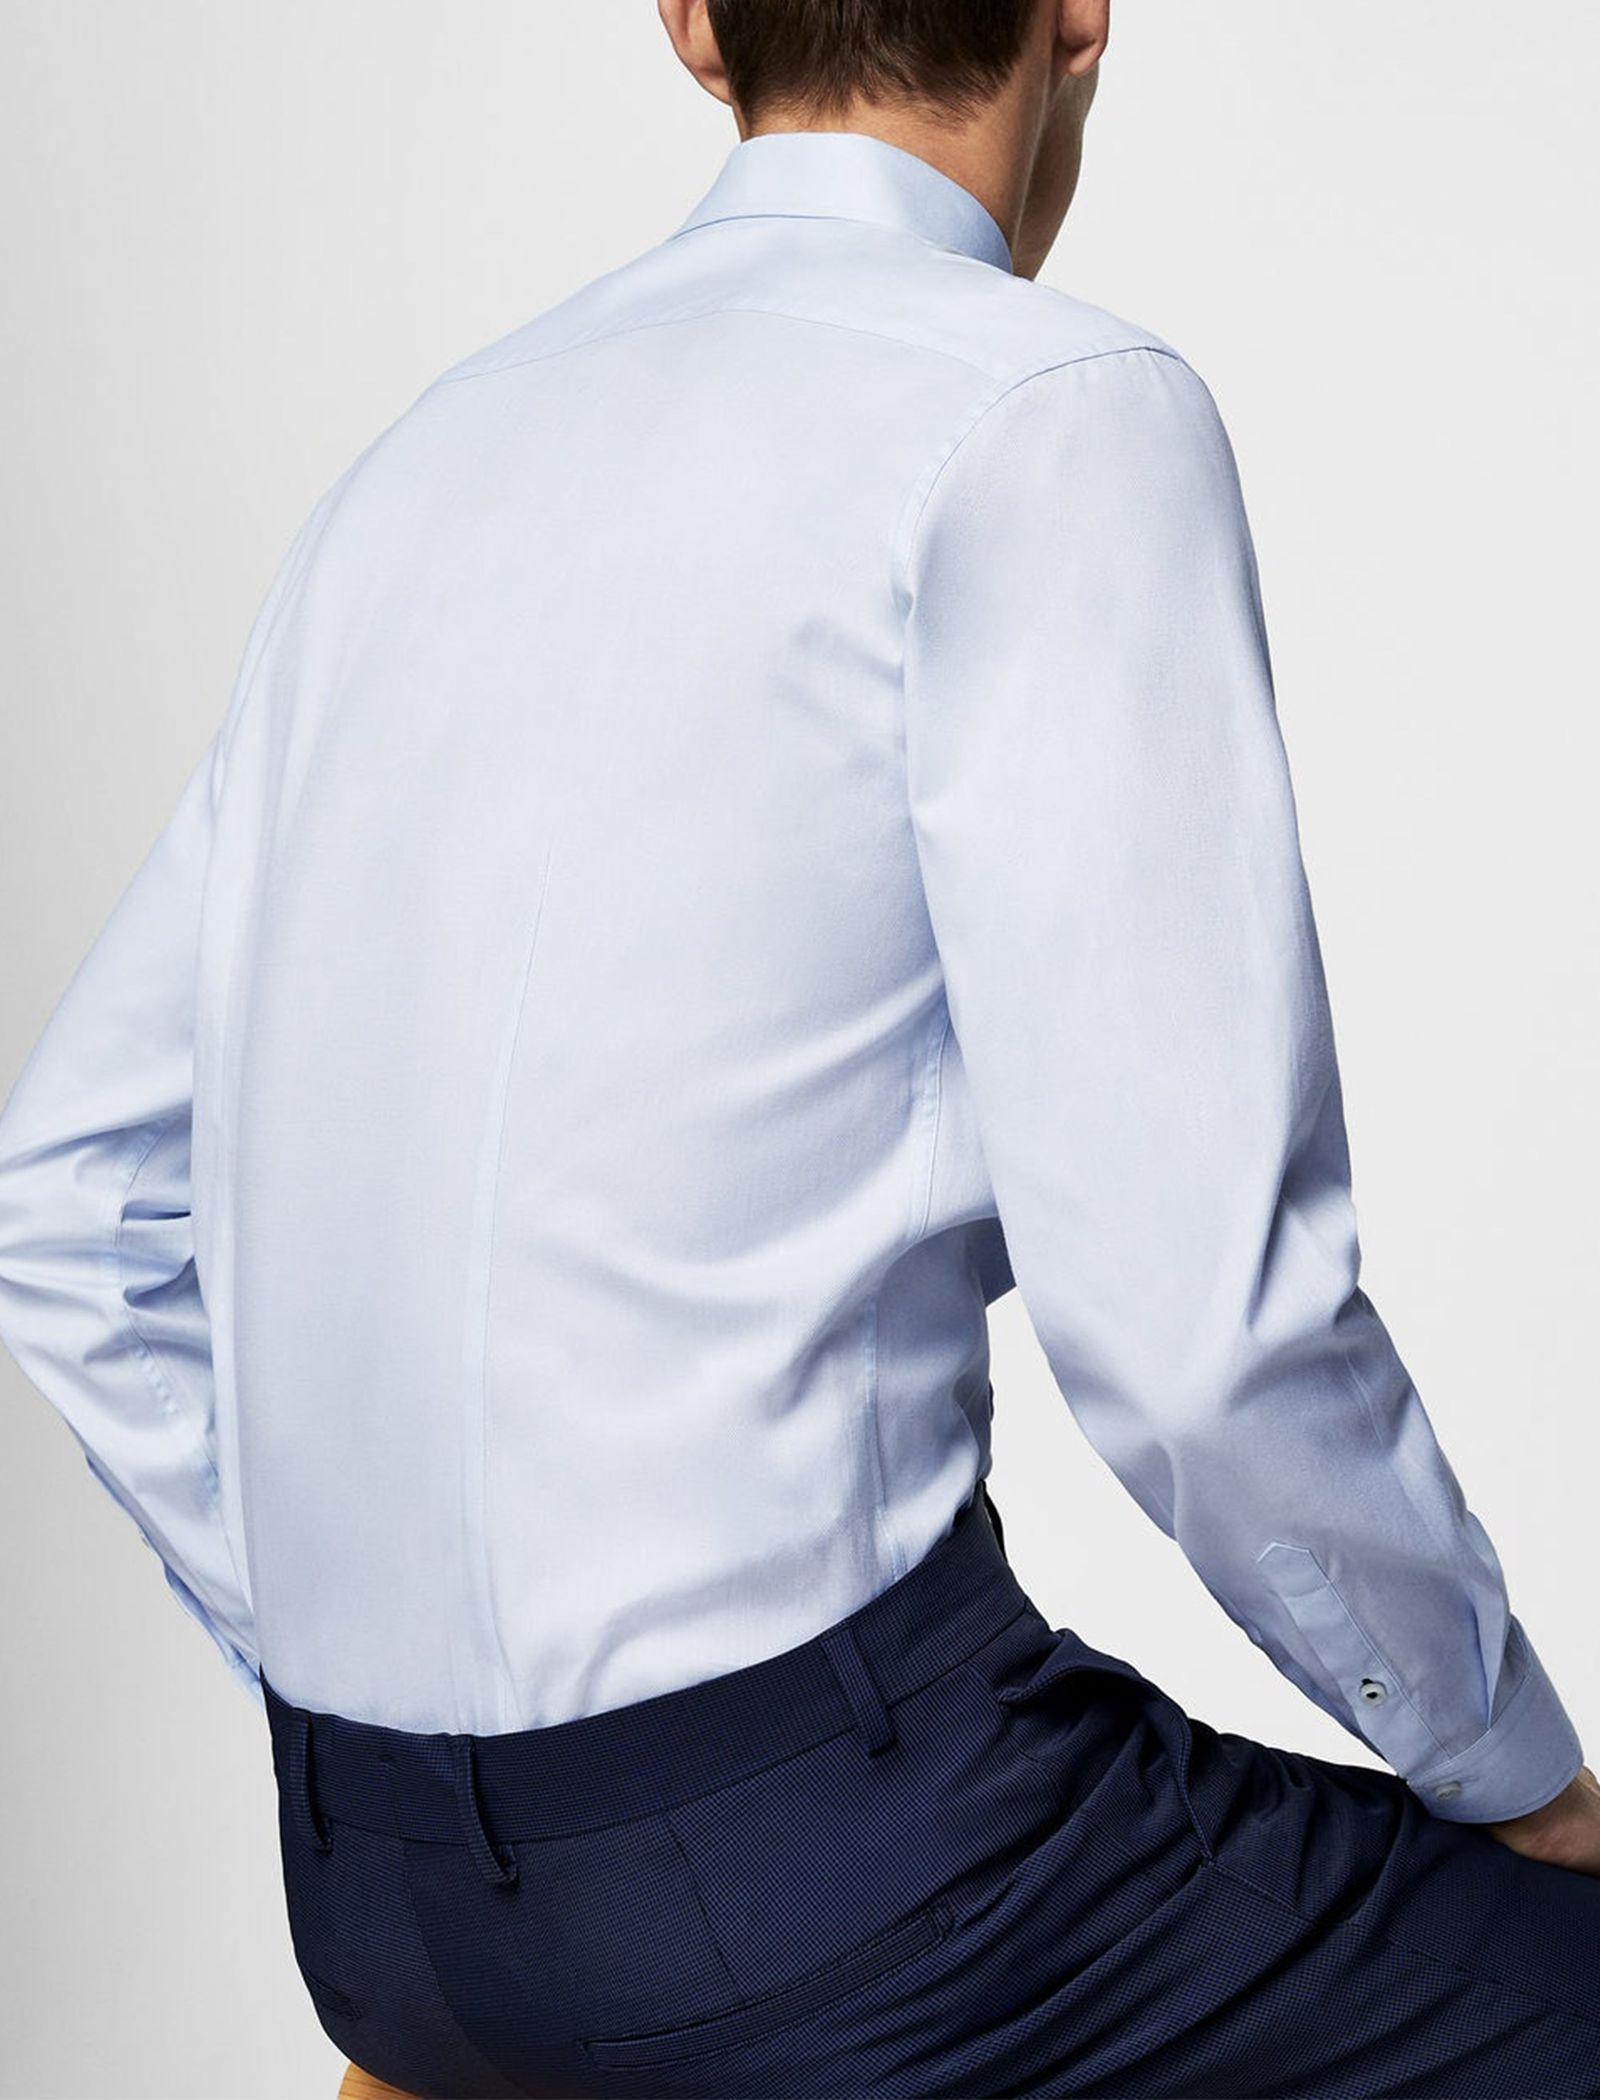 پیراهن نخی آستین بلند مردانه - مانگو - آبي روشن - 2